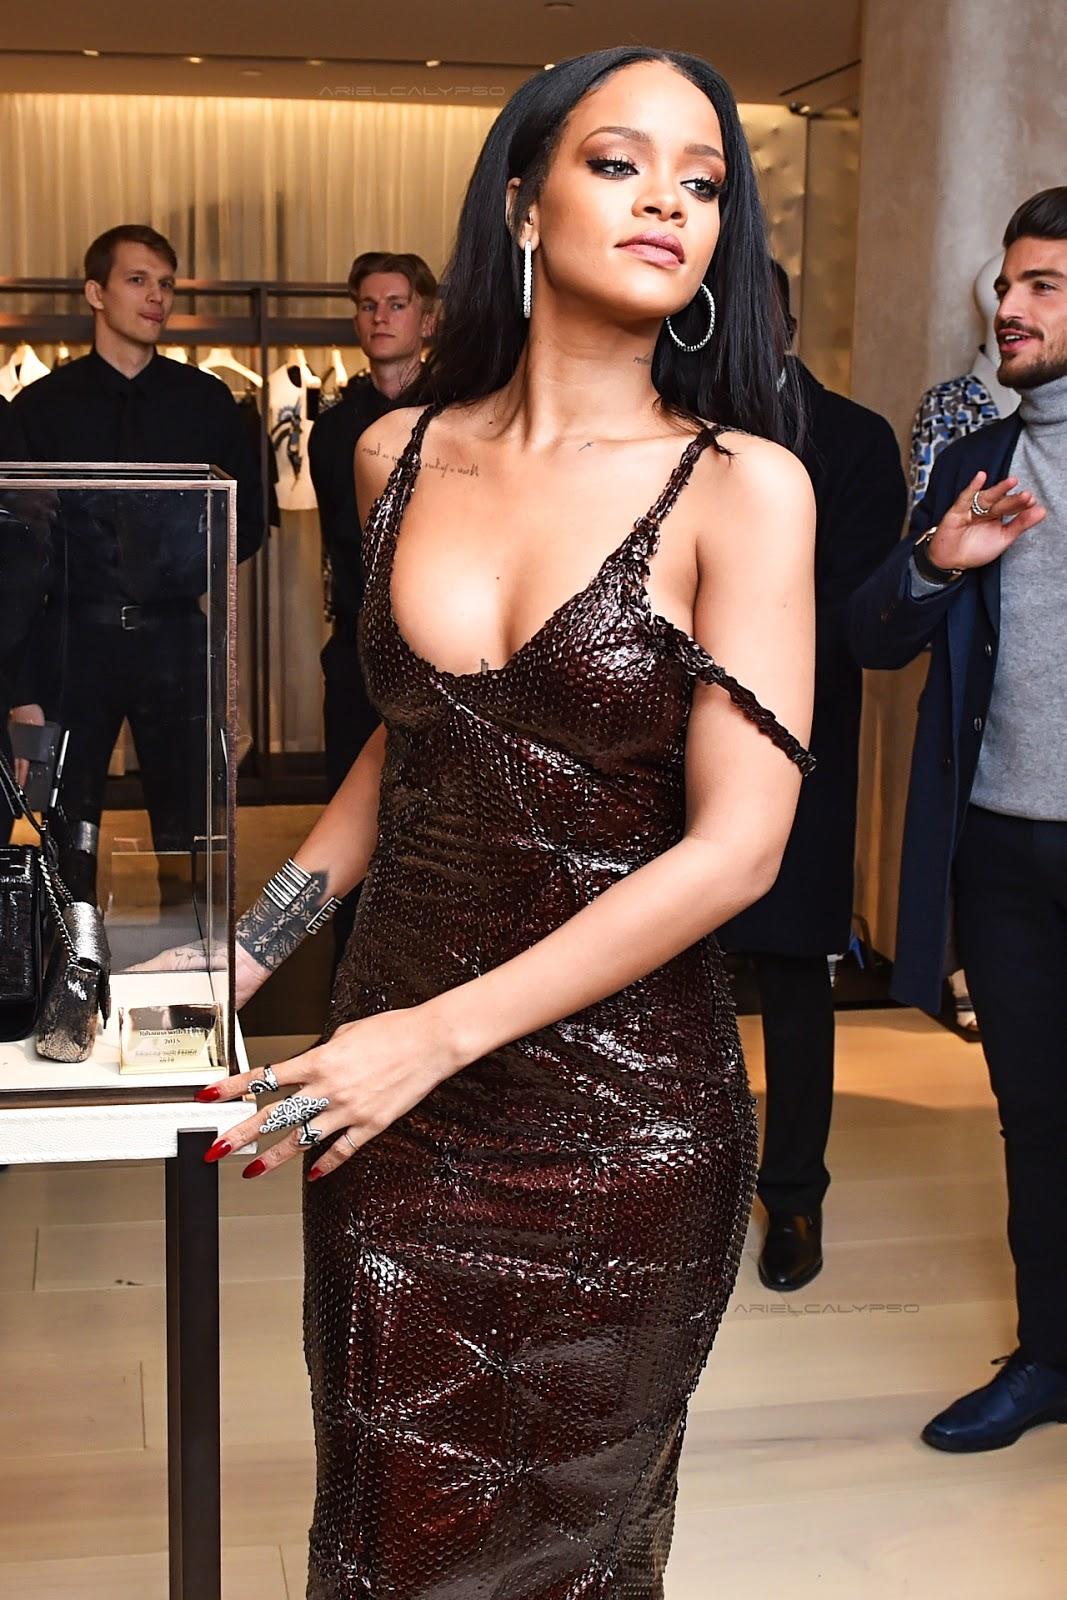 Collar Bone Quote Tattoo of Rihanna